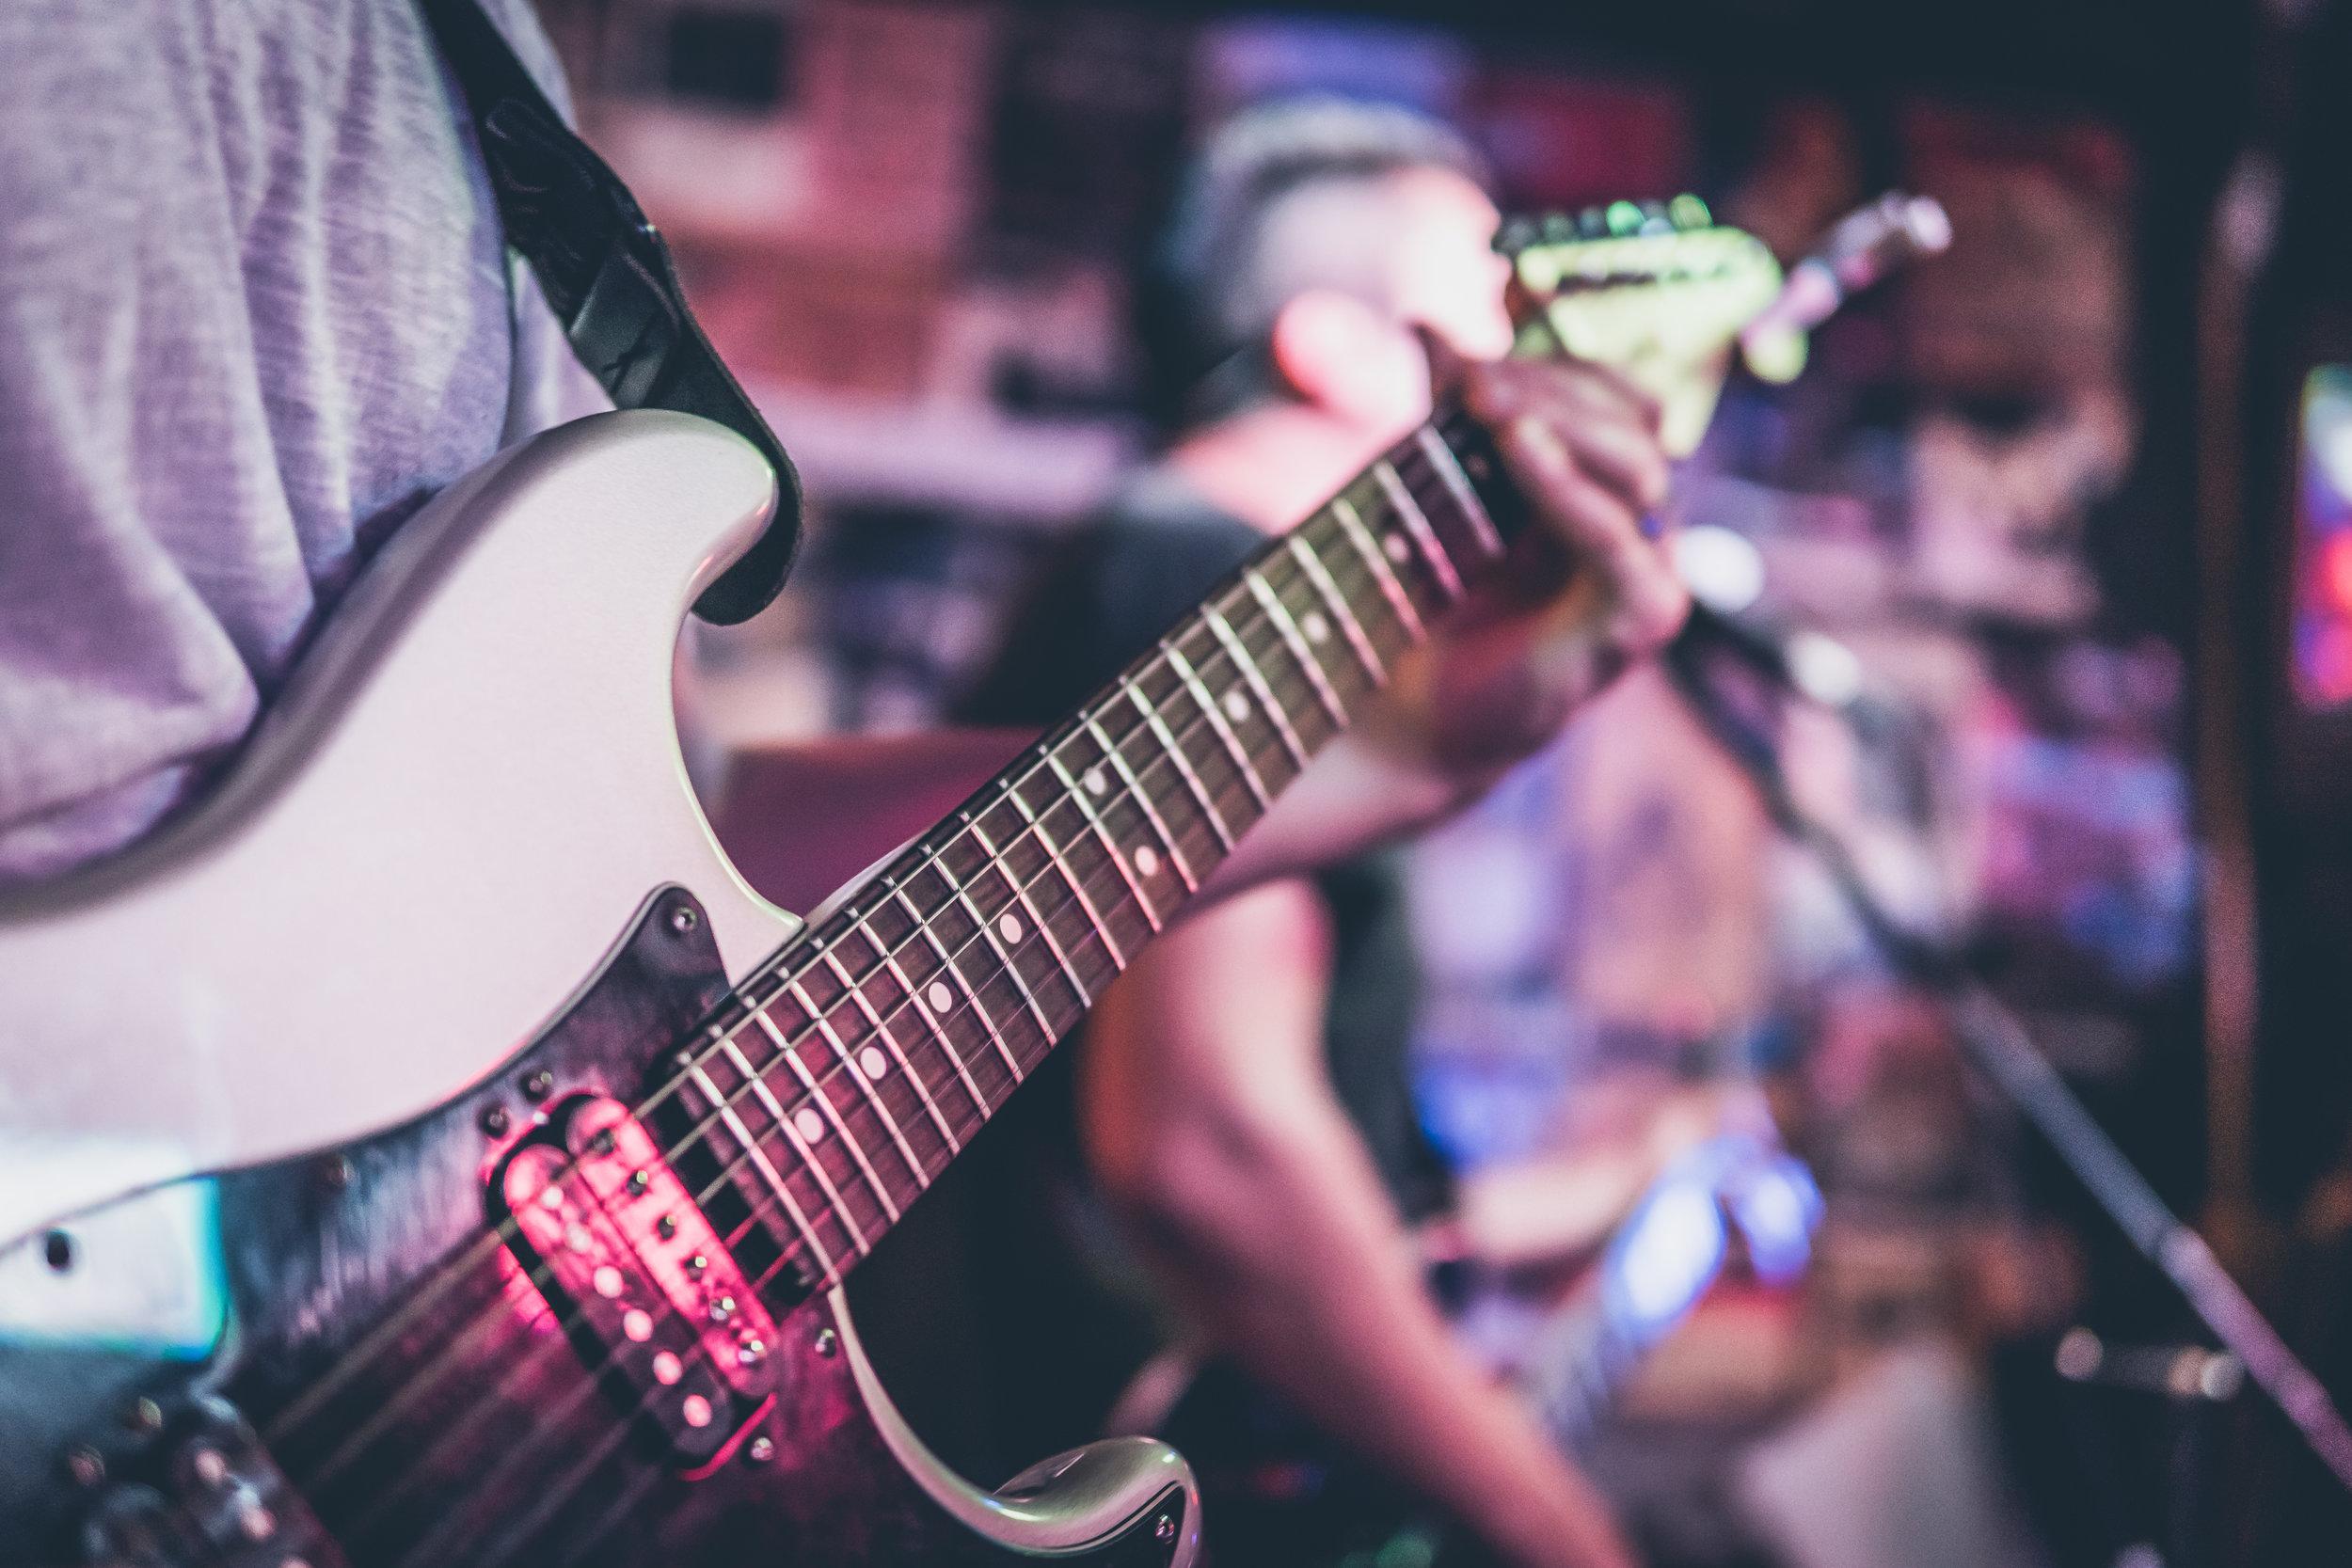 FM Pilots - Tulsa Rock Band - The Boobie Trap Bar Topeka, KS 070916-3.jpg